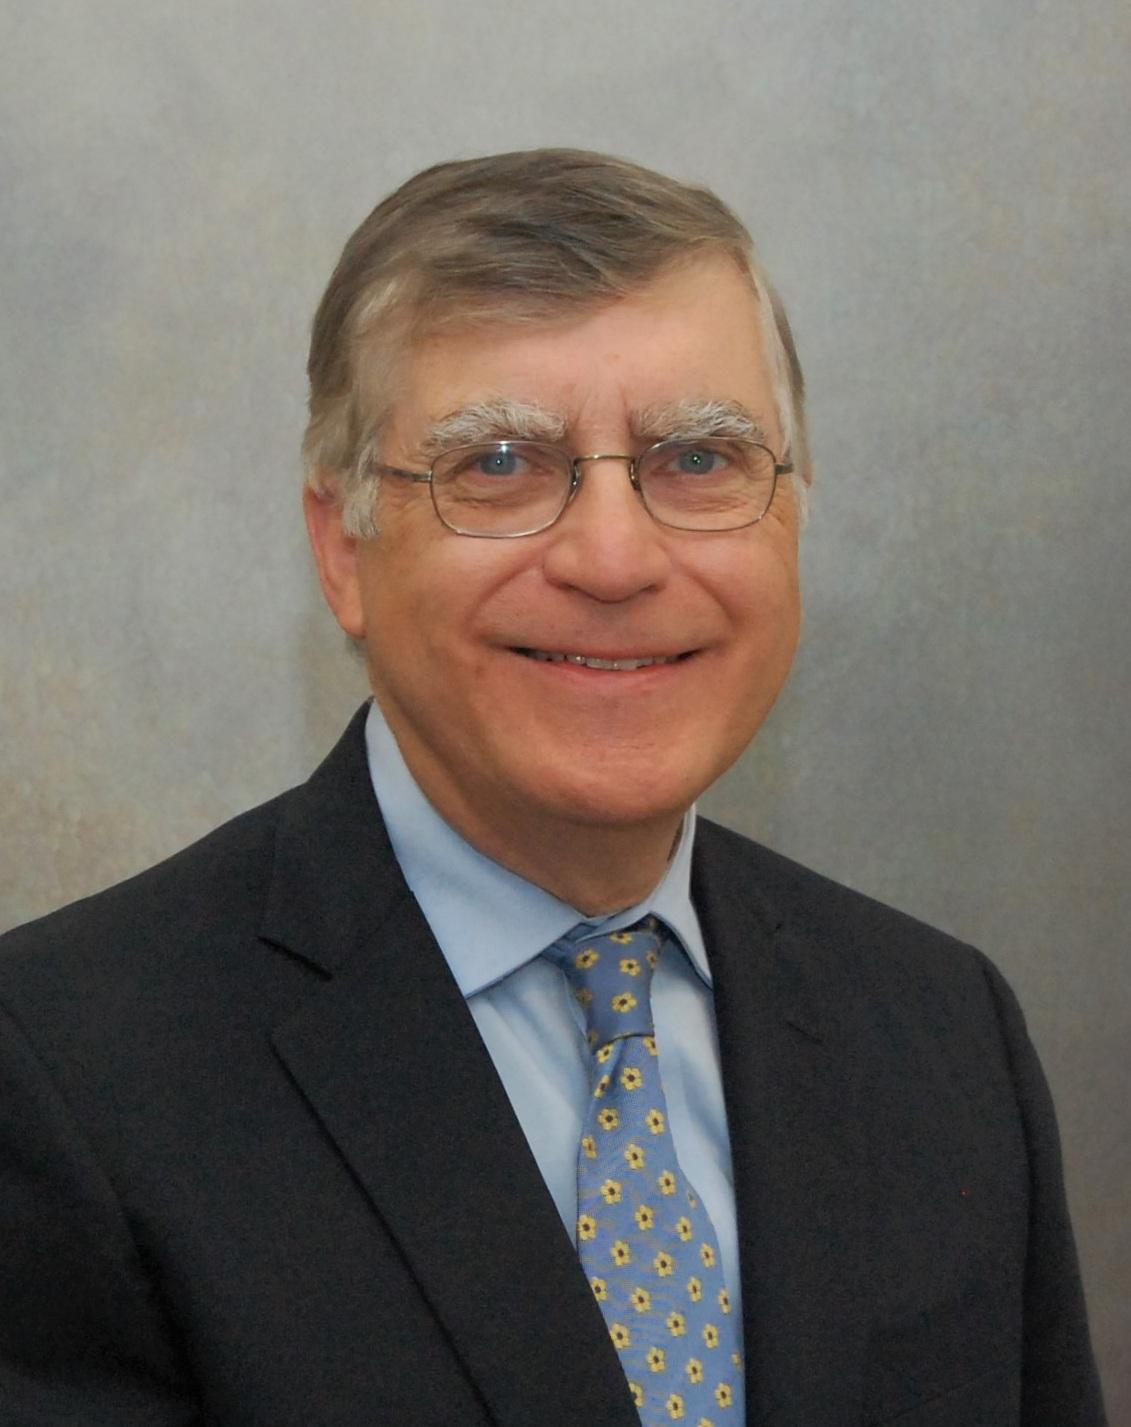 Paul Kretschmann